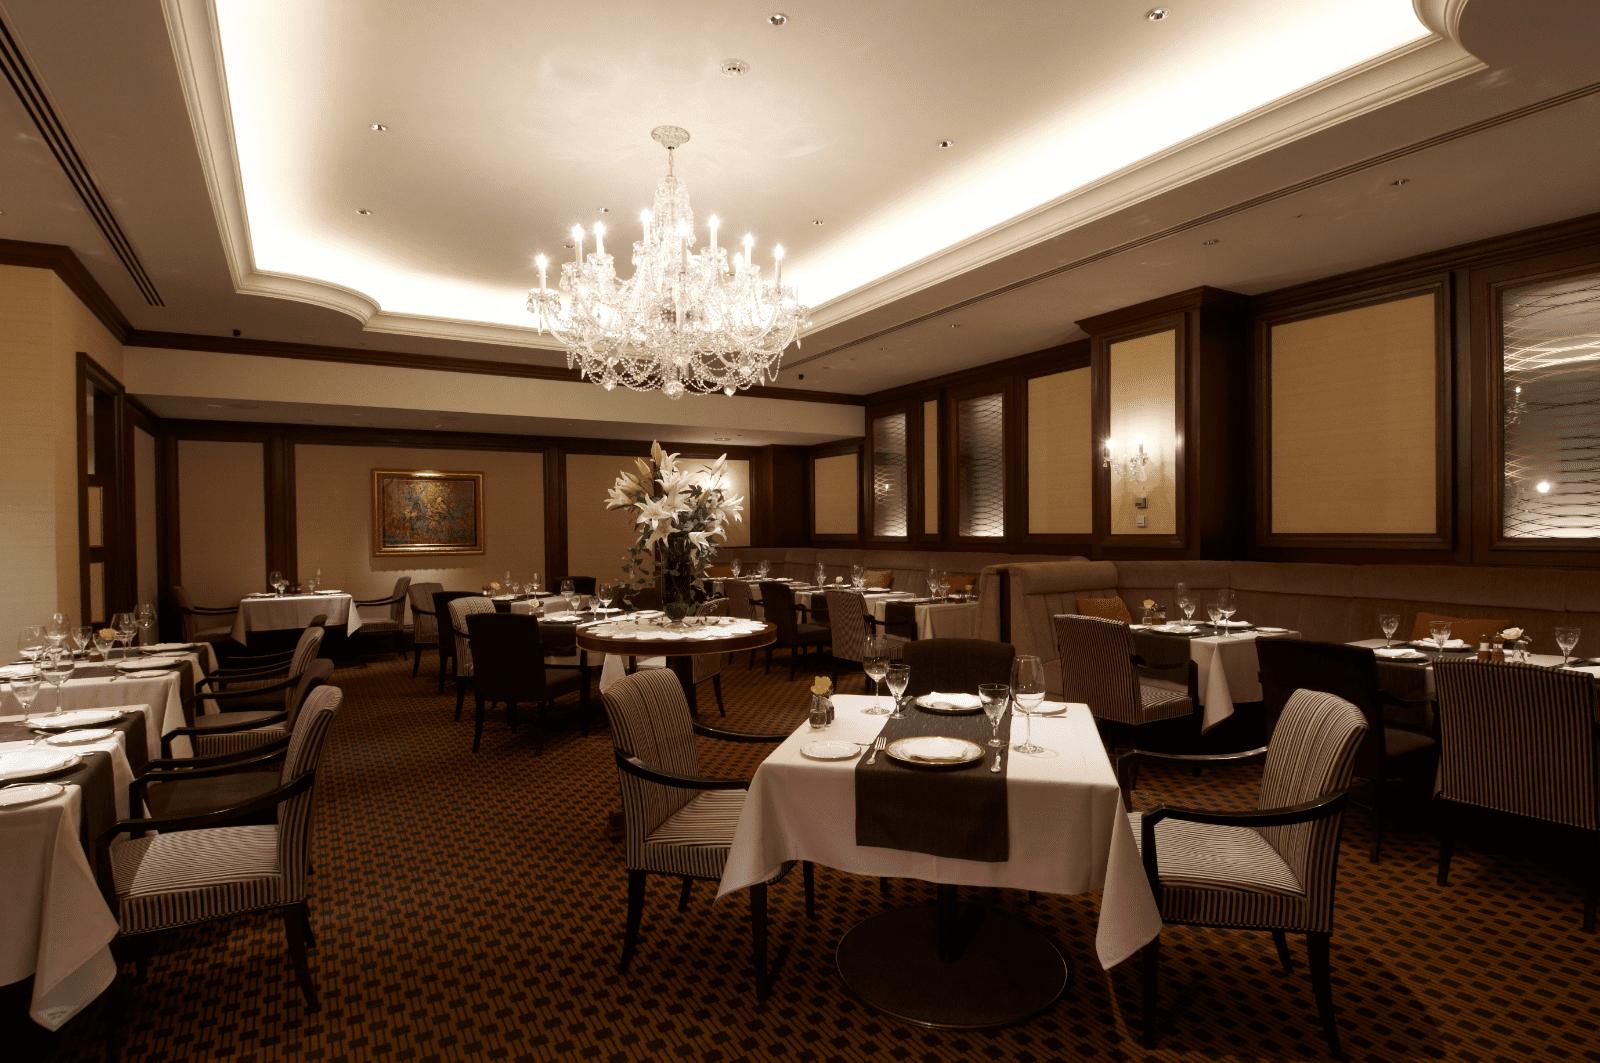 nyosuikaikan restaurant Jupiter